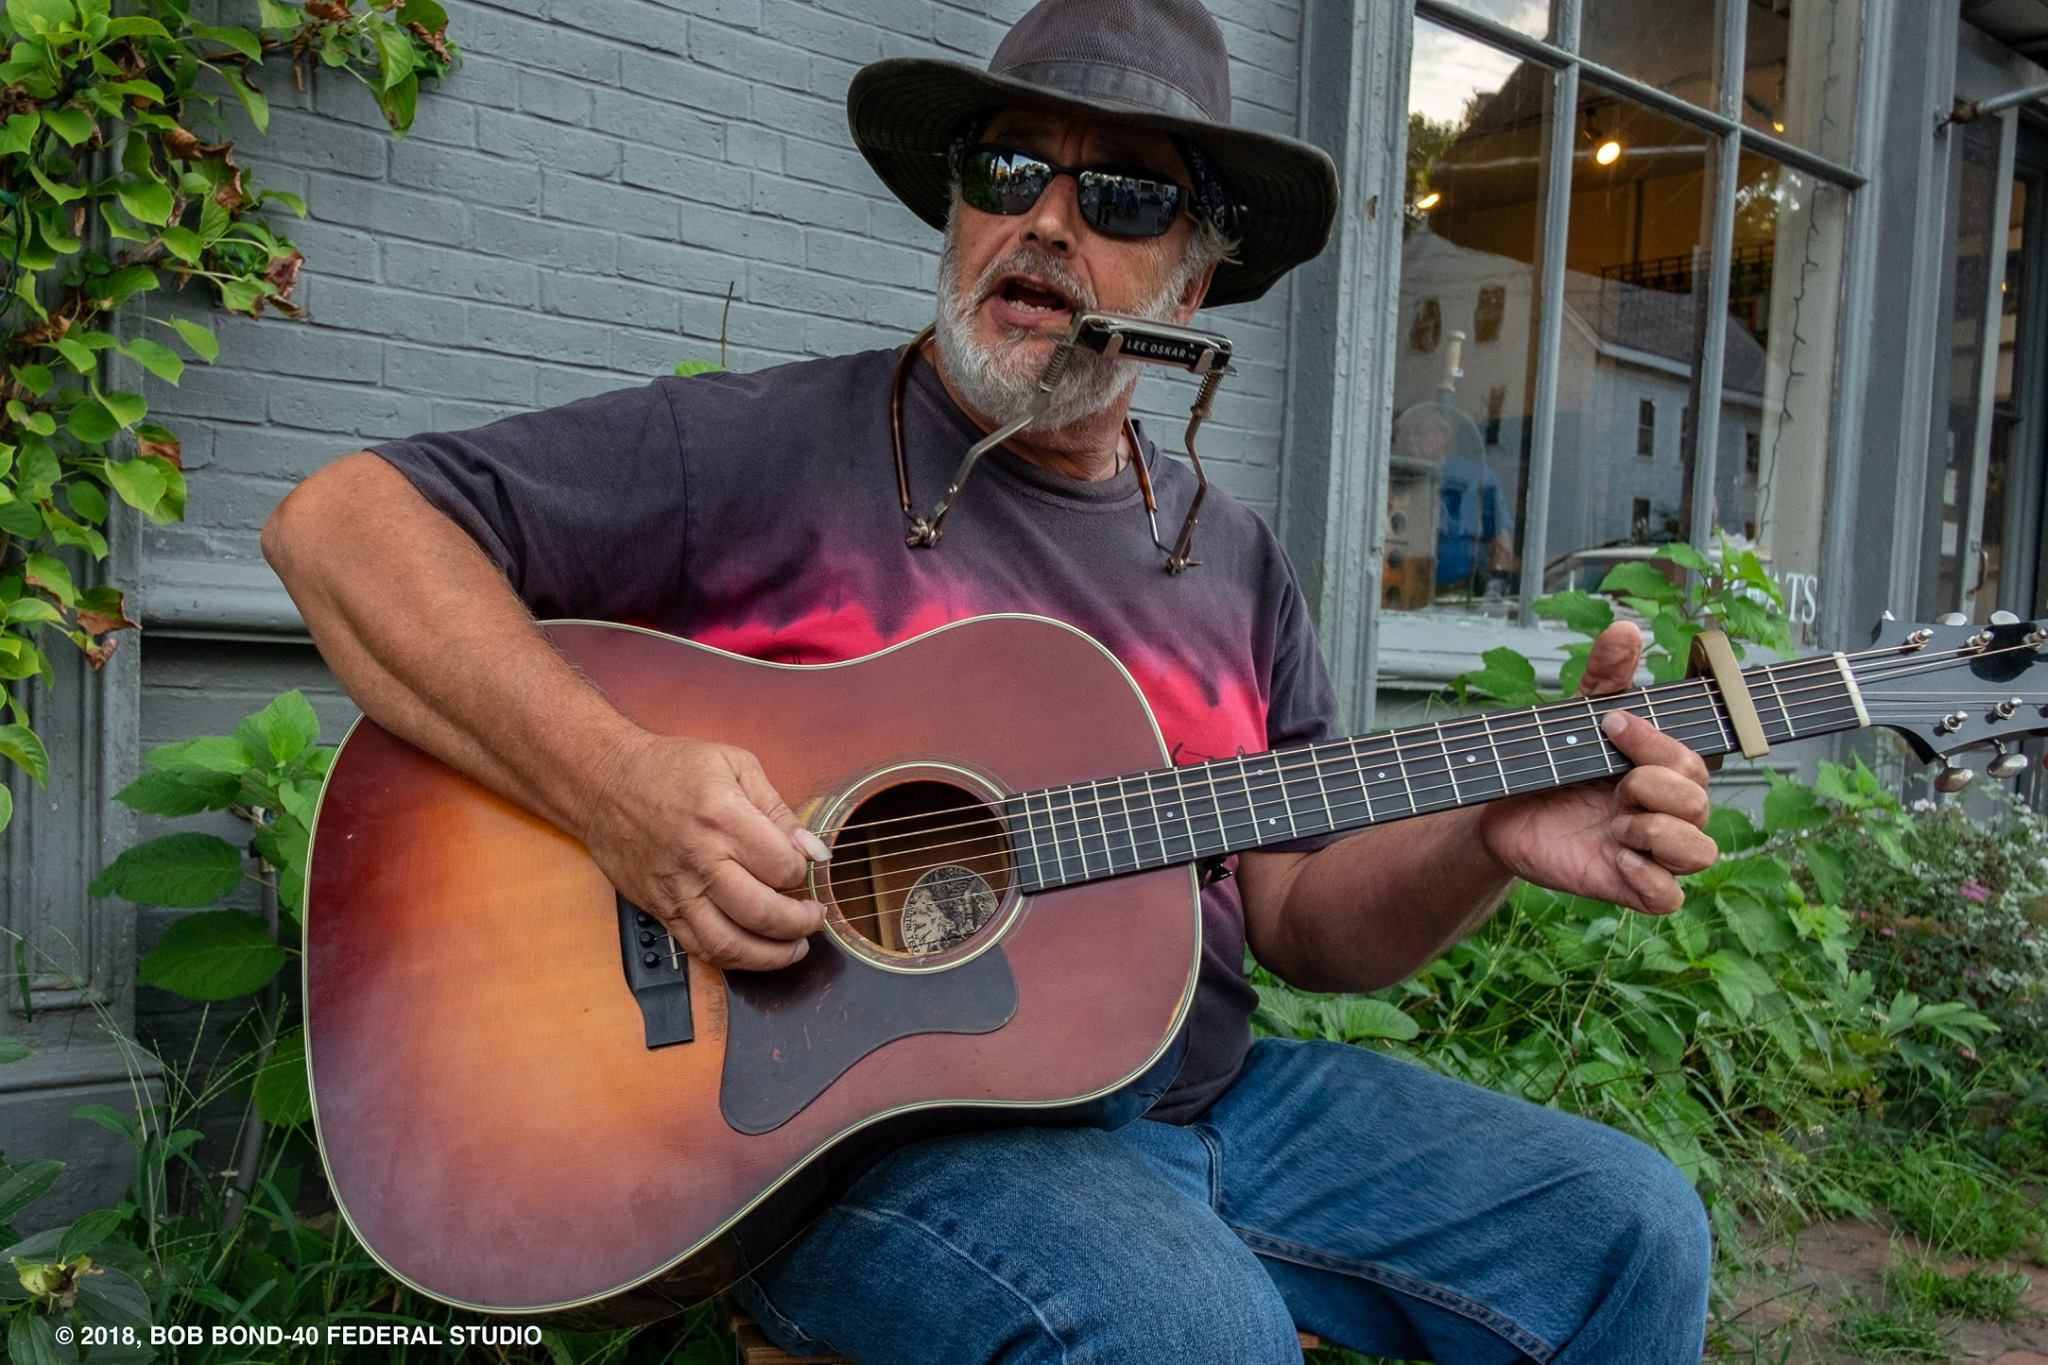 Rick Turcotte plays on the sidewalks (Bob Bond photo)